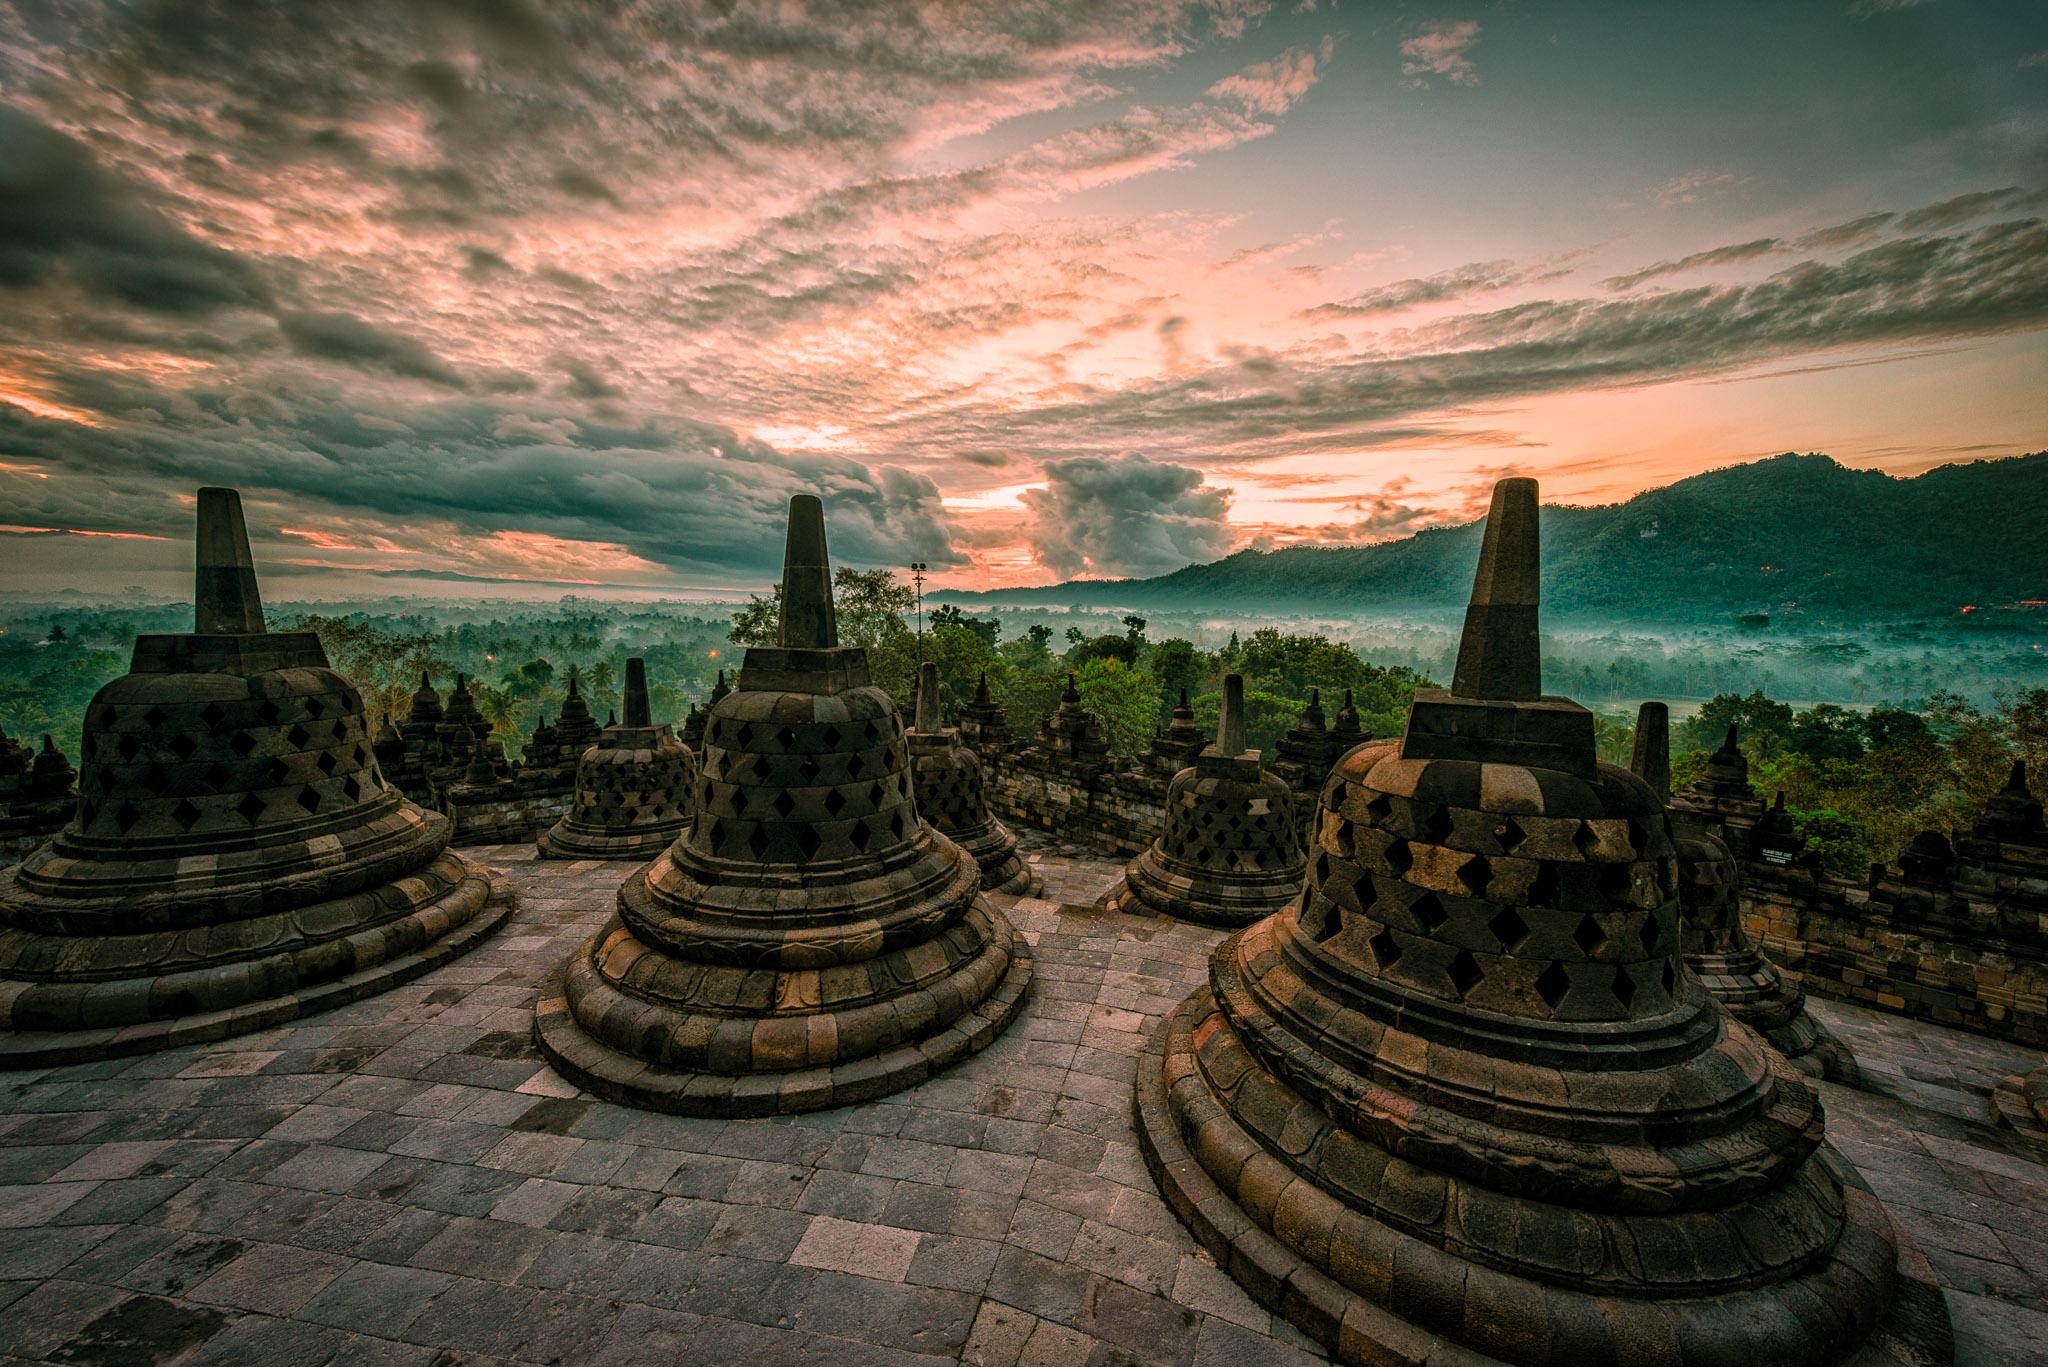 Borobudur Sunrise - Iksa Menajang